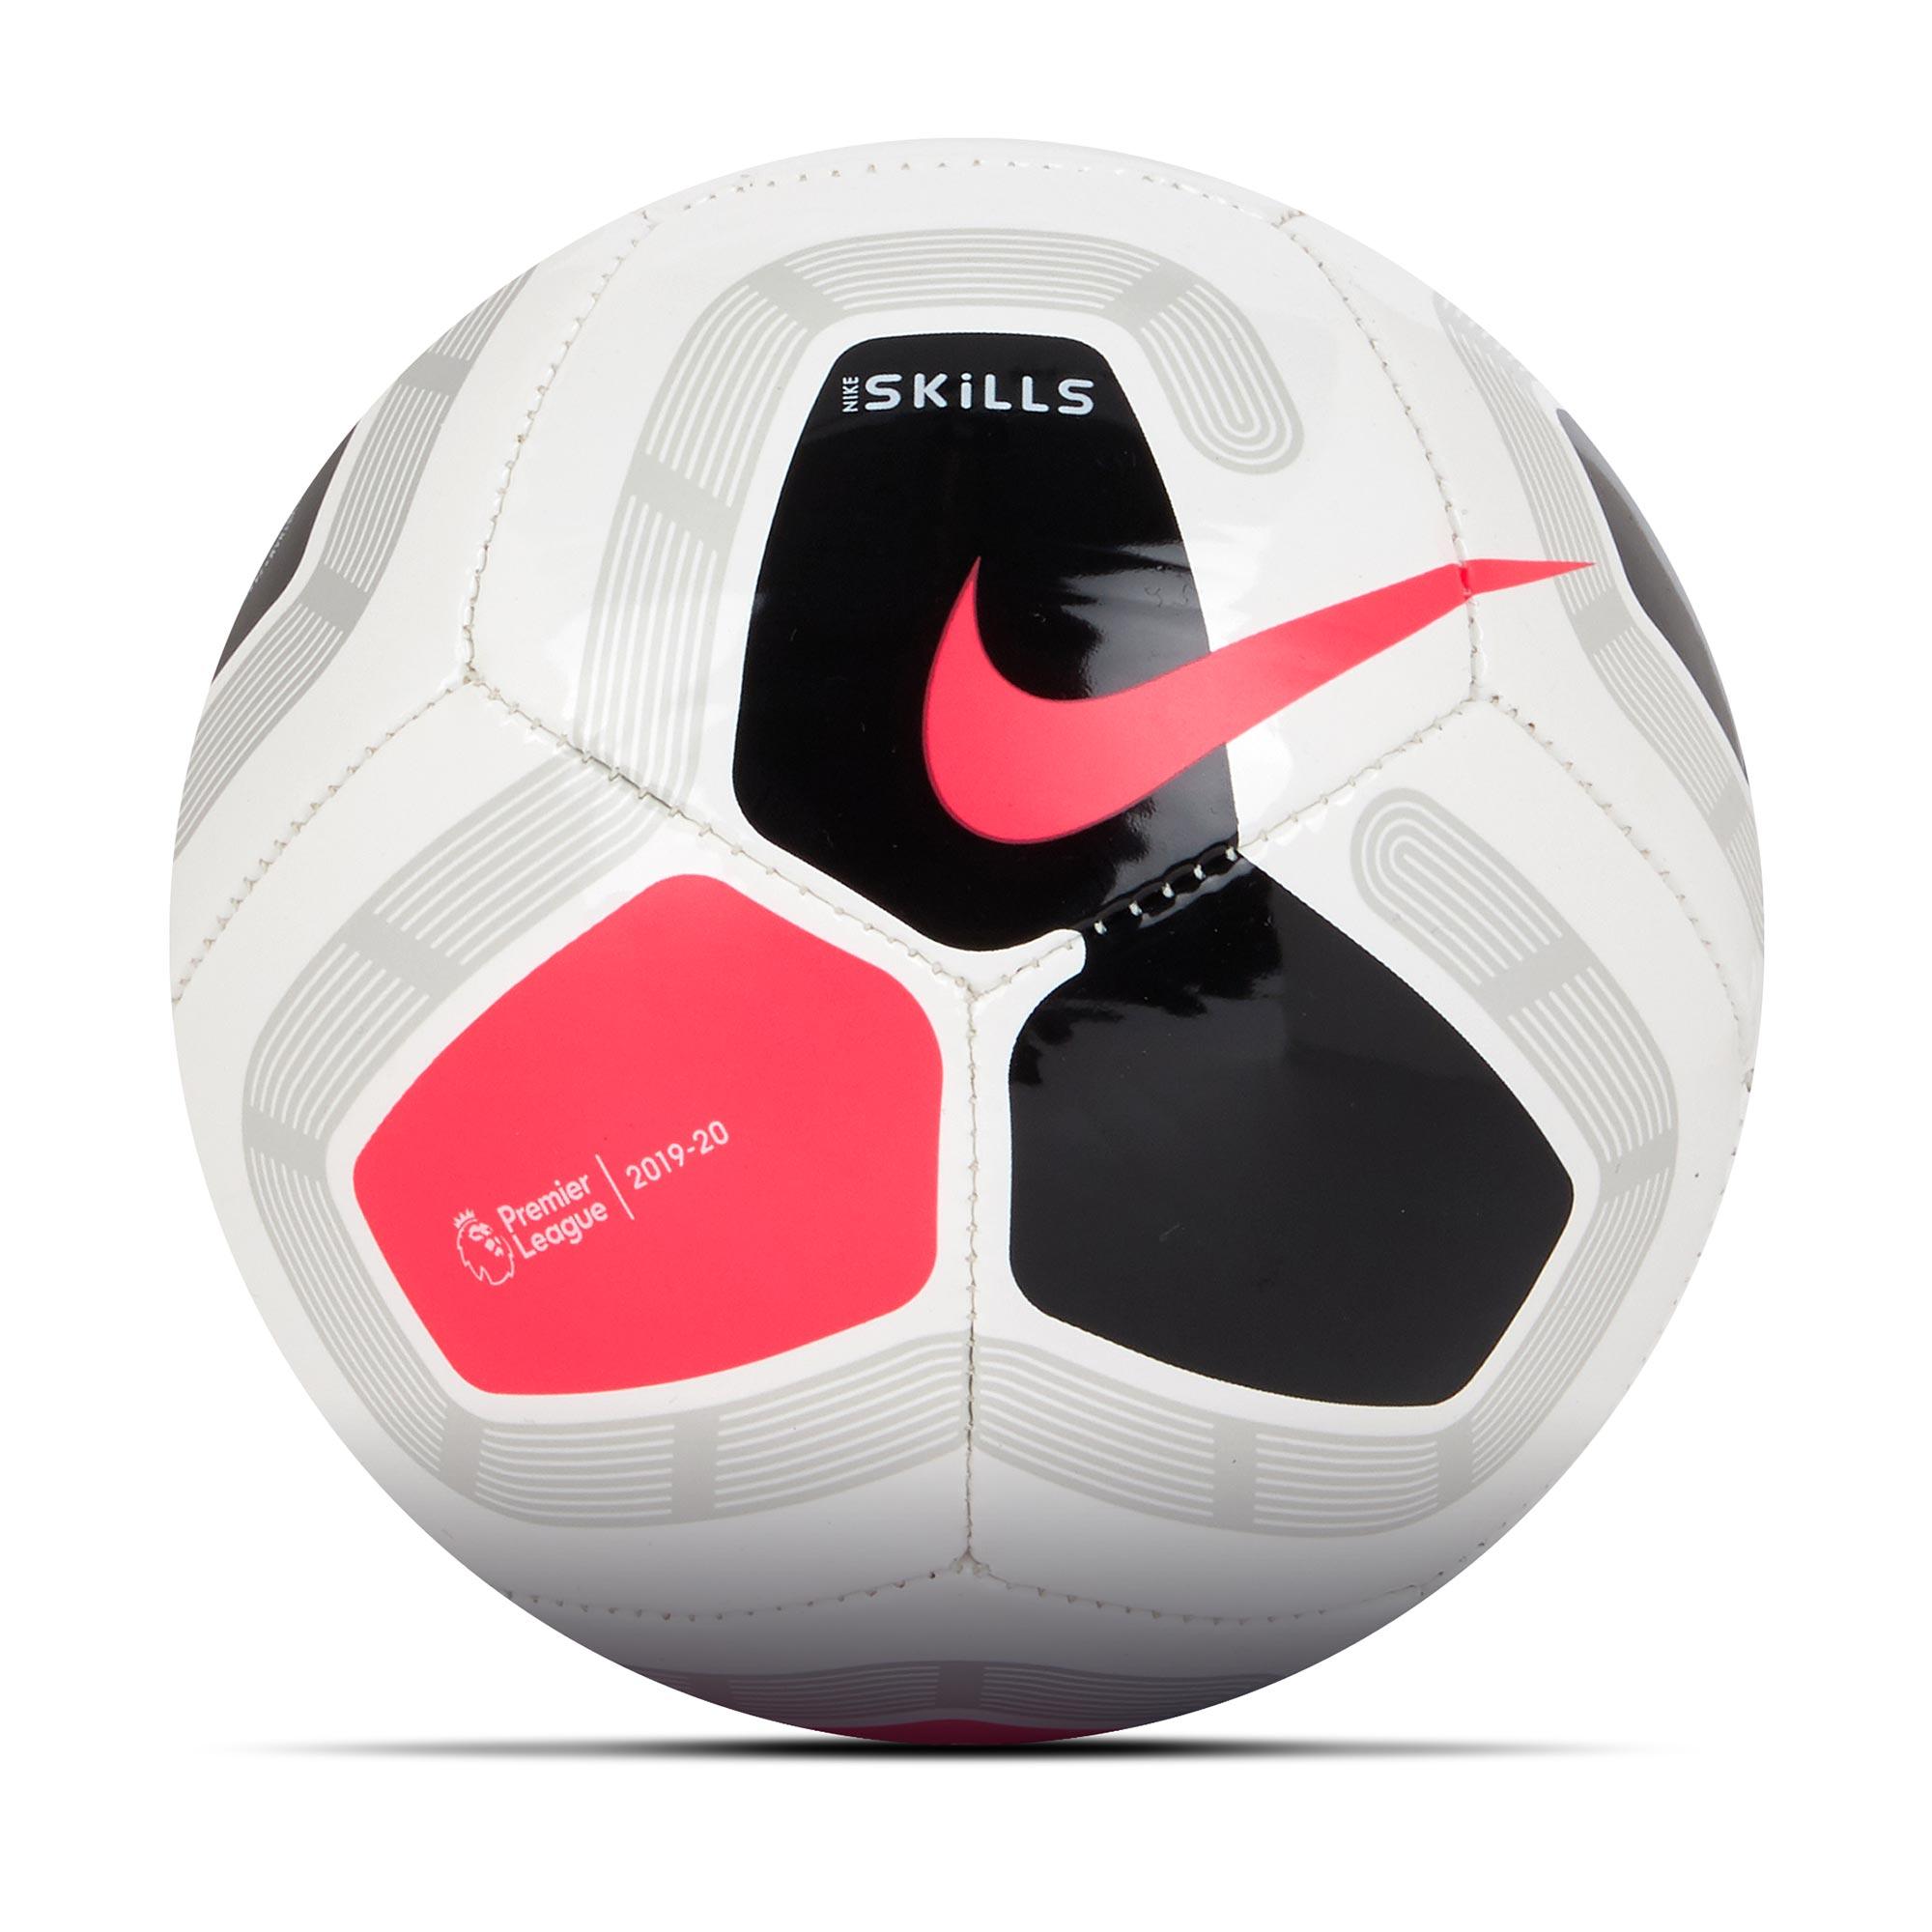 Balón de fútbol Nike Premier League Skills - blanco